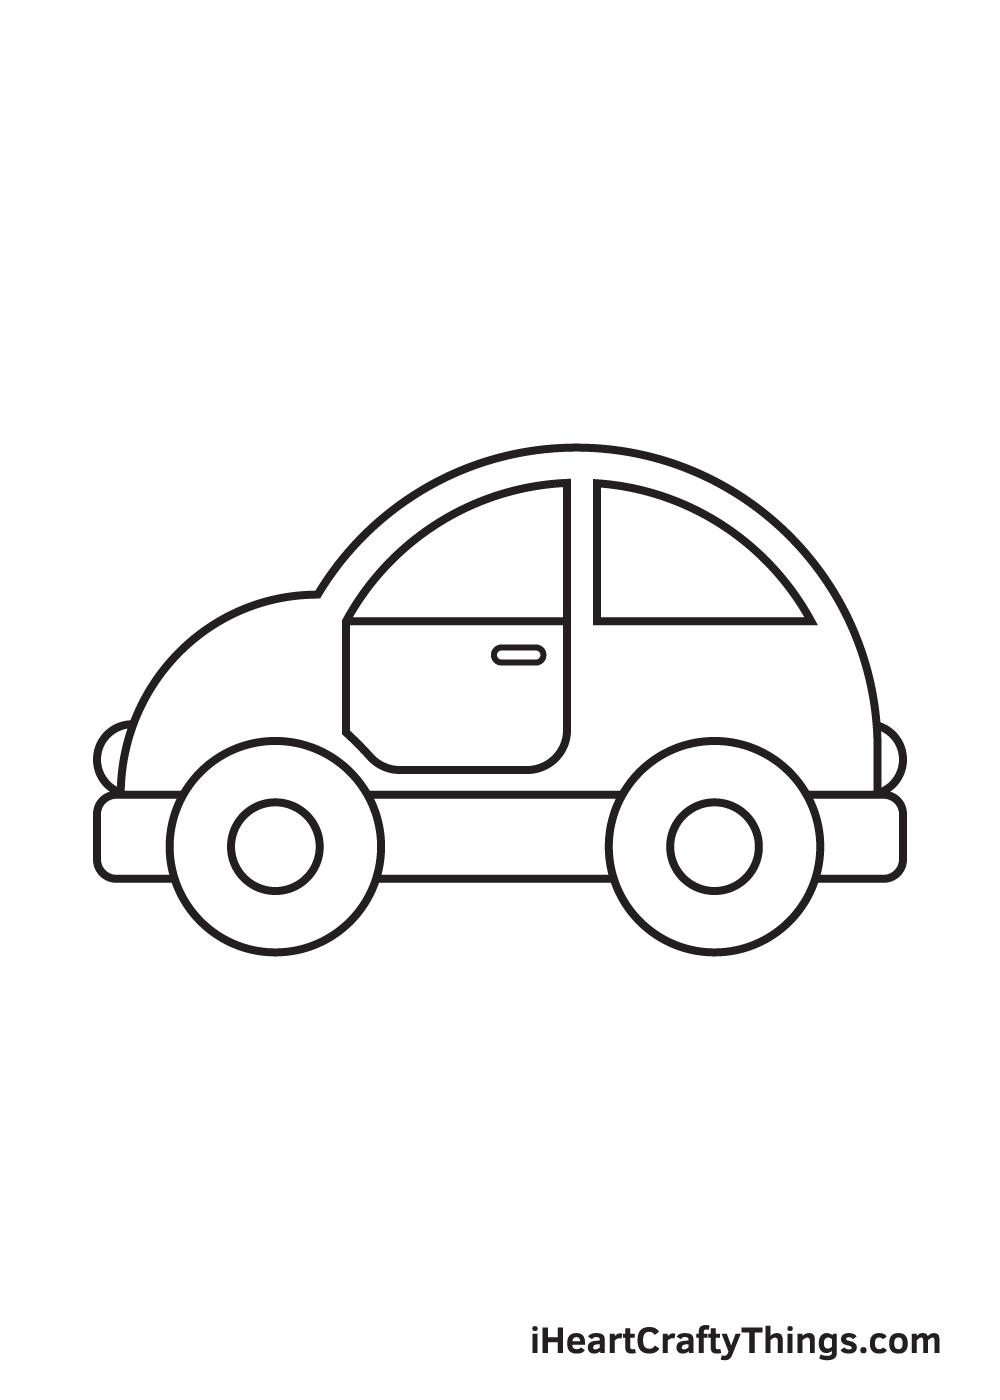 car drawing – step 8